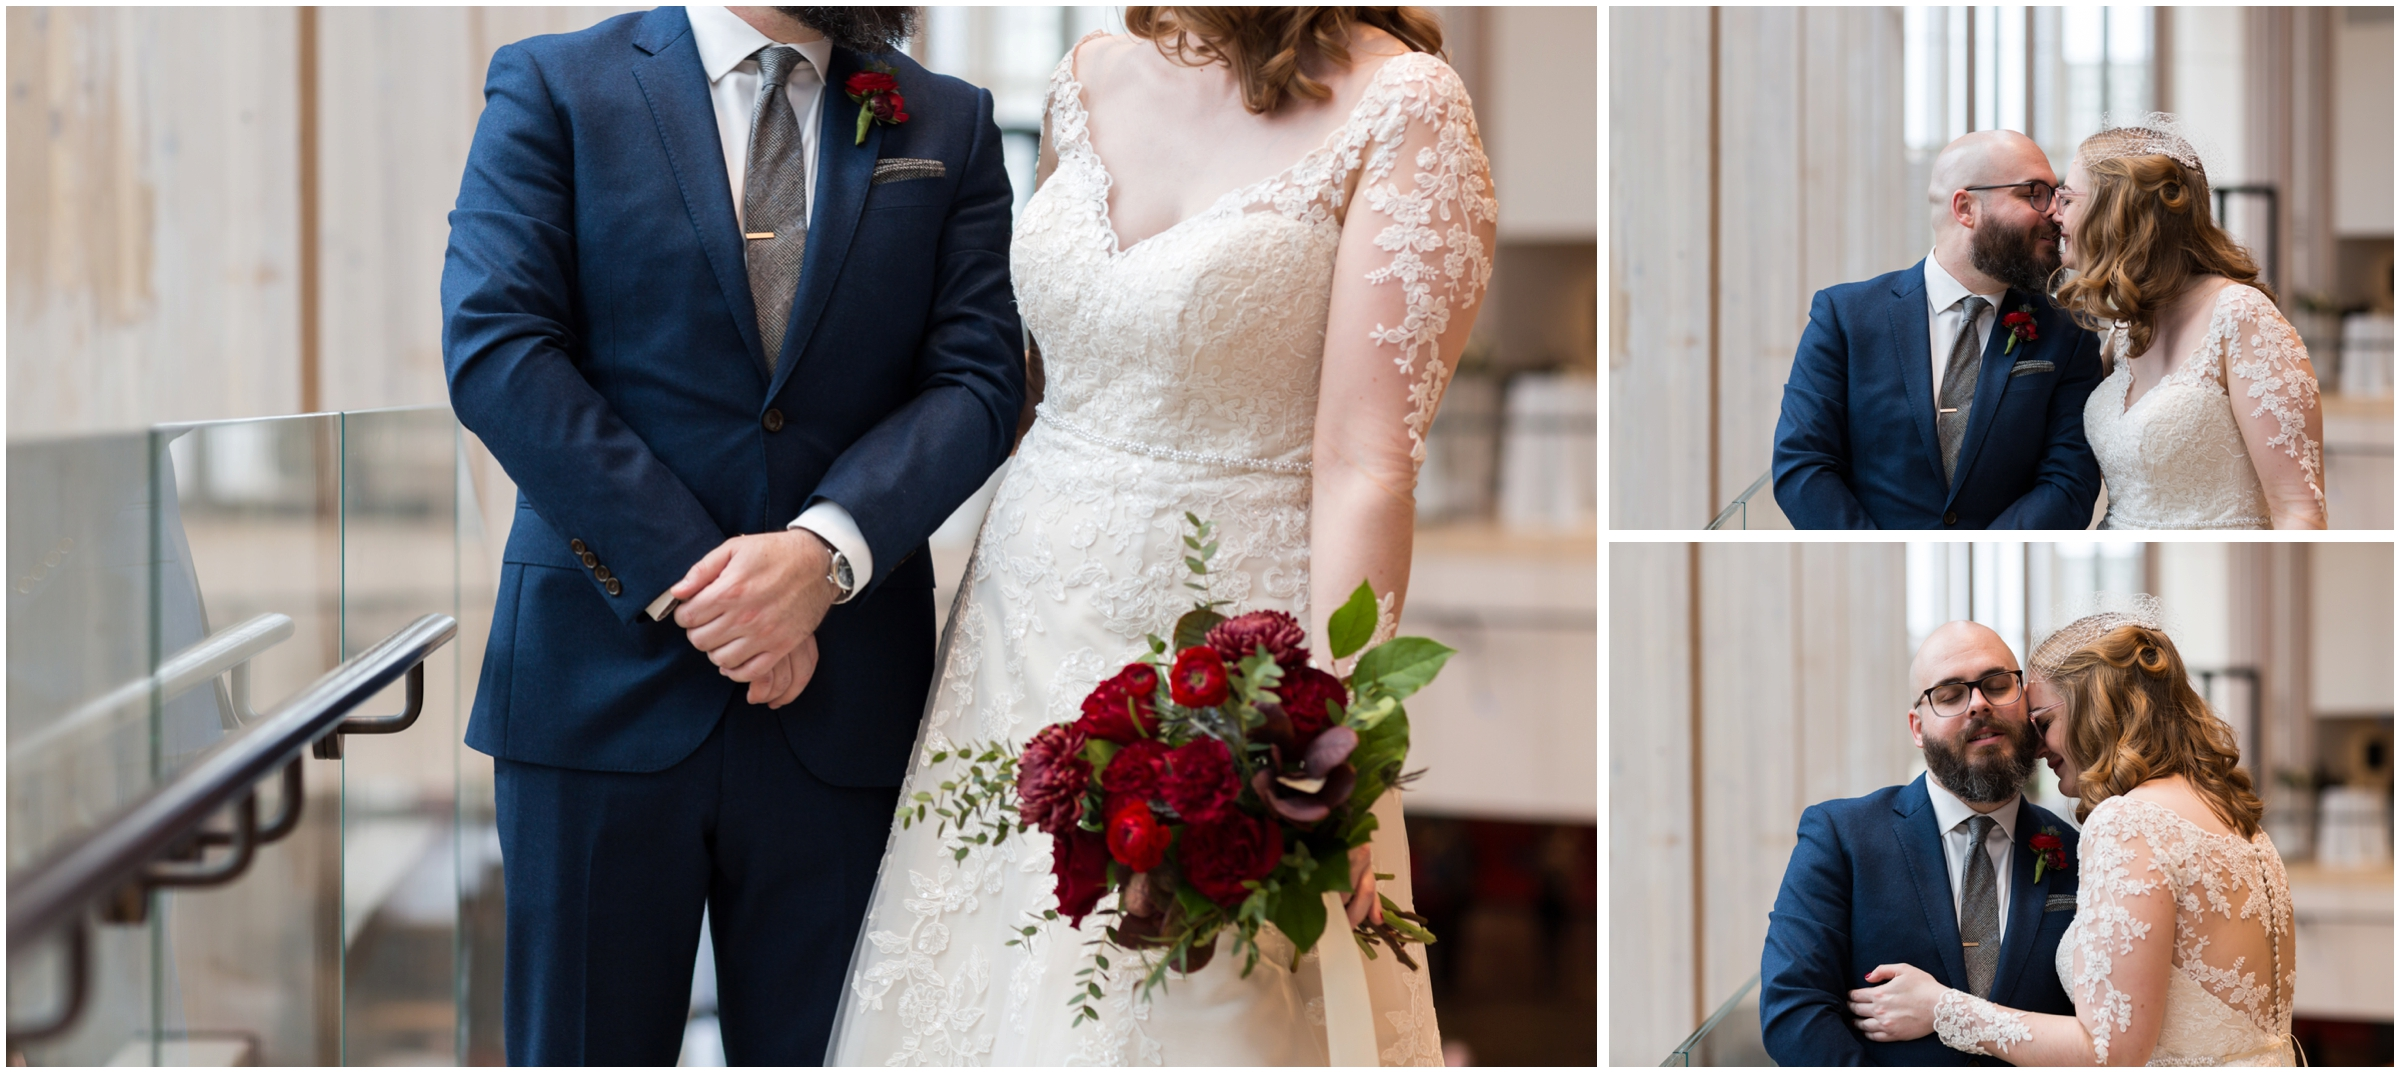 Ottaw Wedding Allison Andrew - (Selena Phillips-Boyle)_0049.jpg